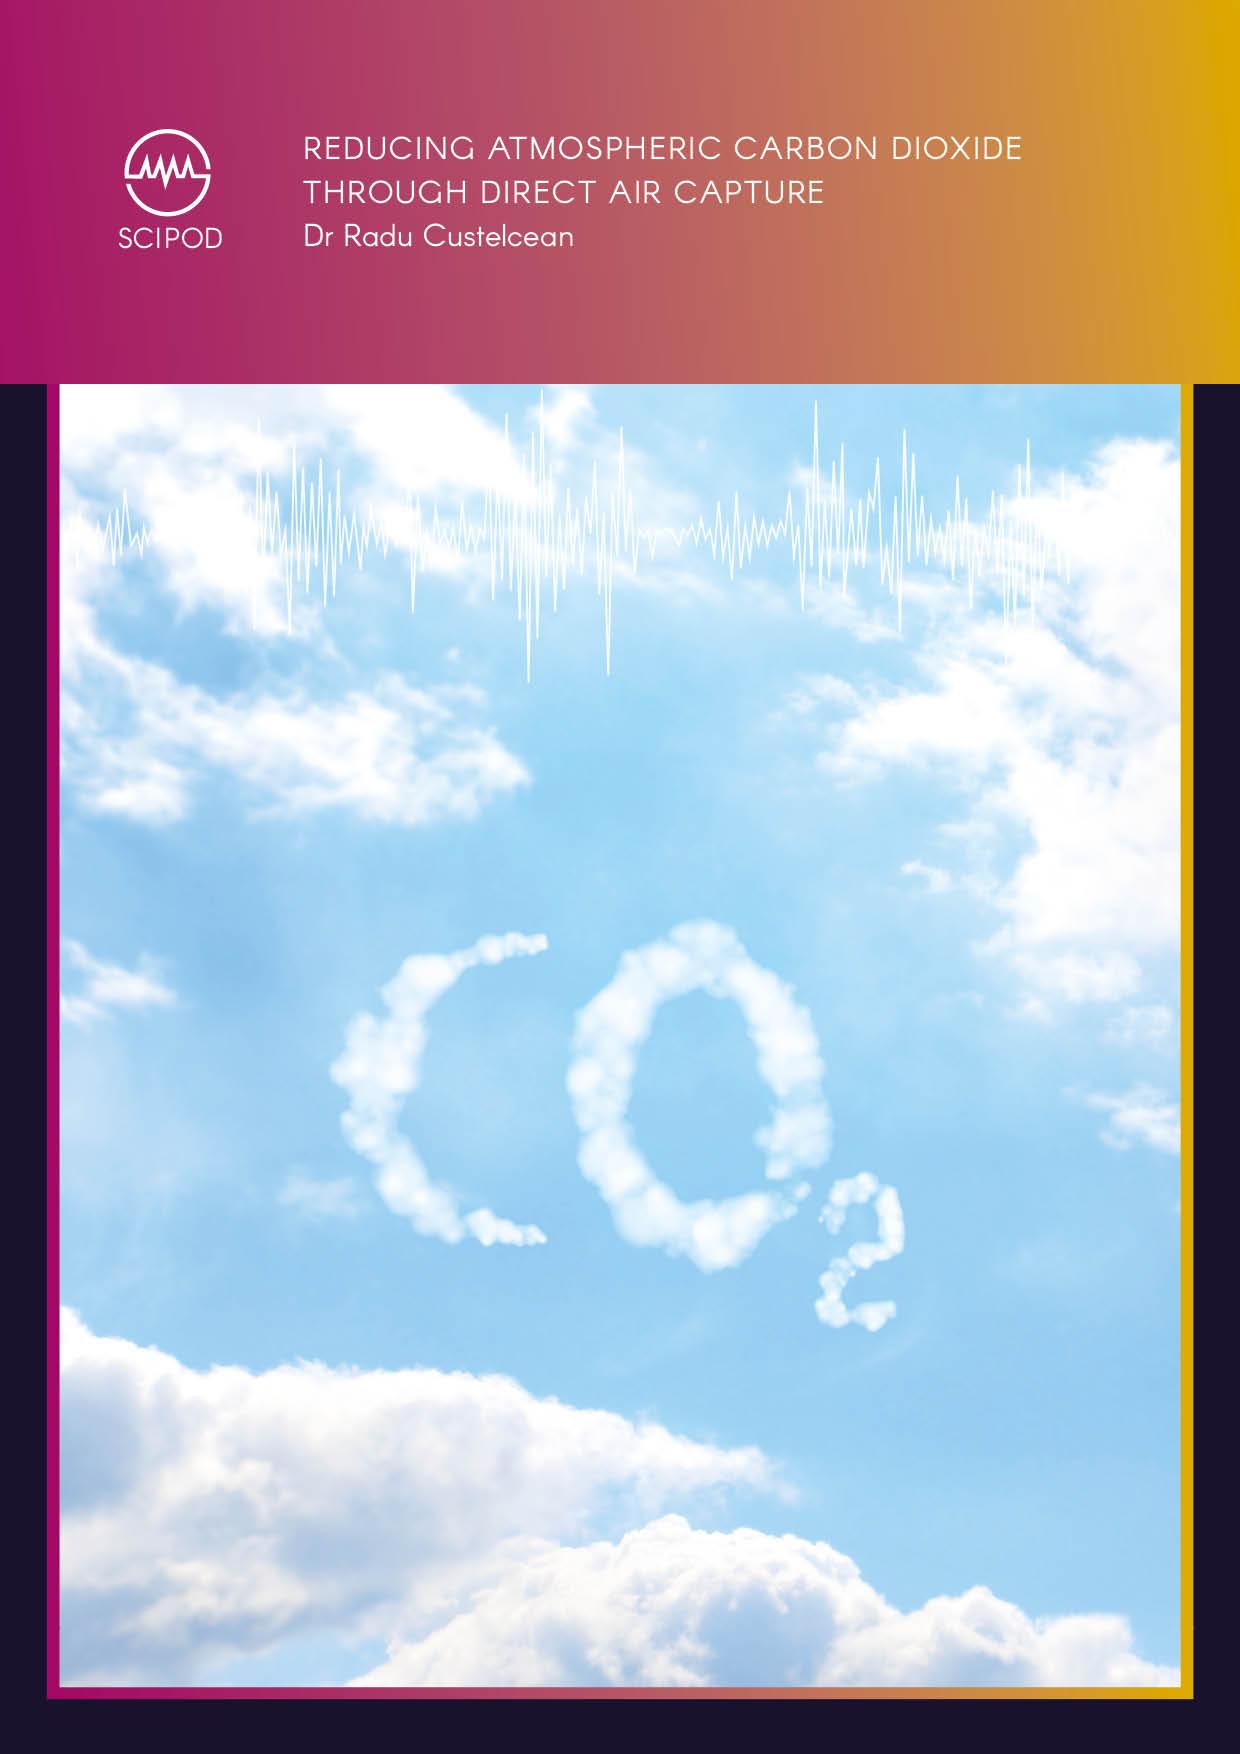 Reducing Atmospheric Carbon Dioxide Through Direct Air Capture – Dr Radu Custelcean, Oak Ridge National Laboratory